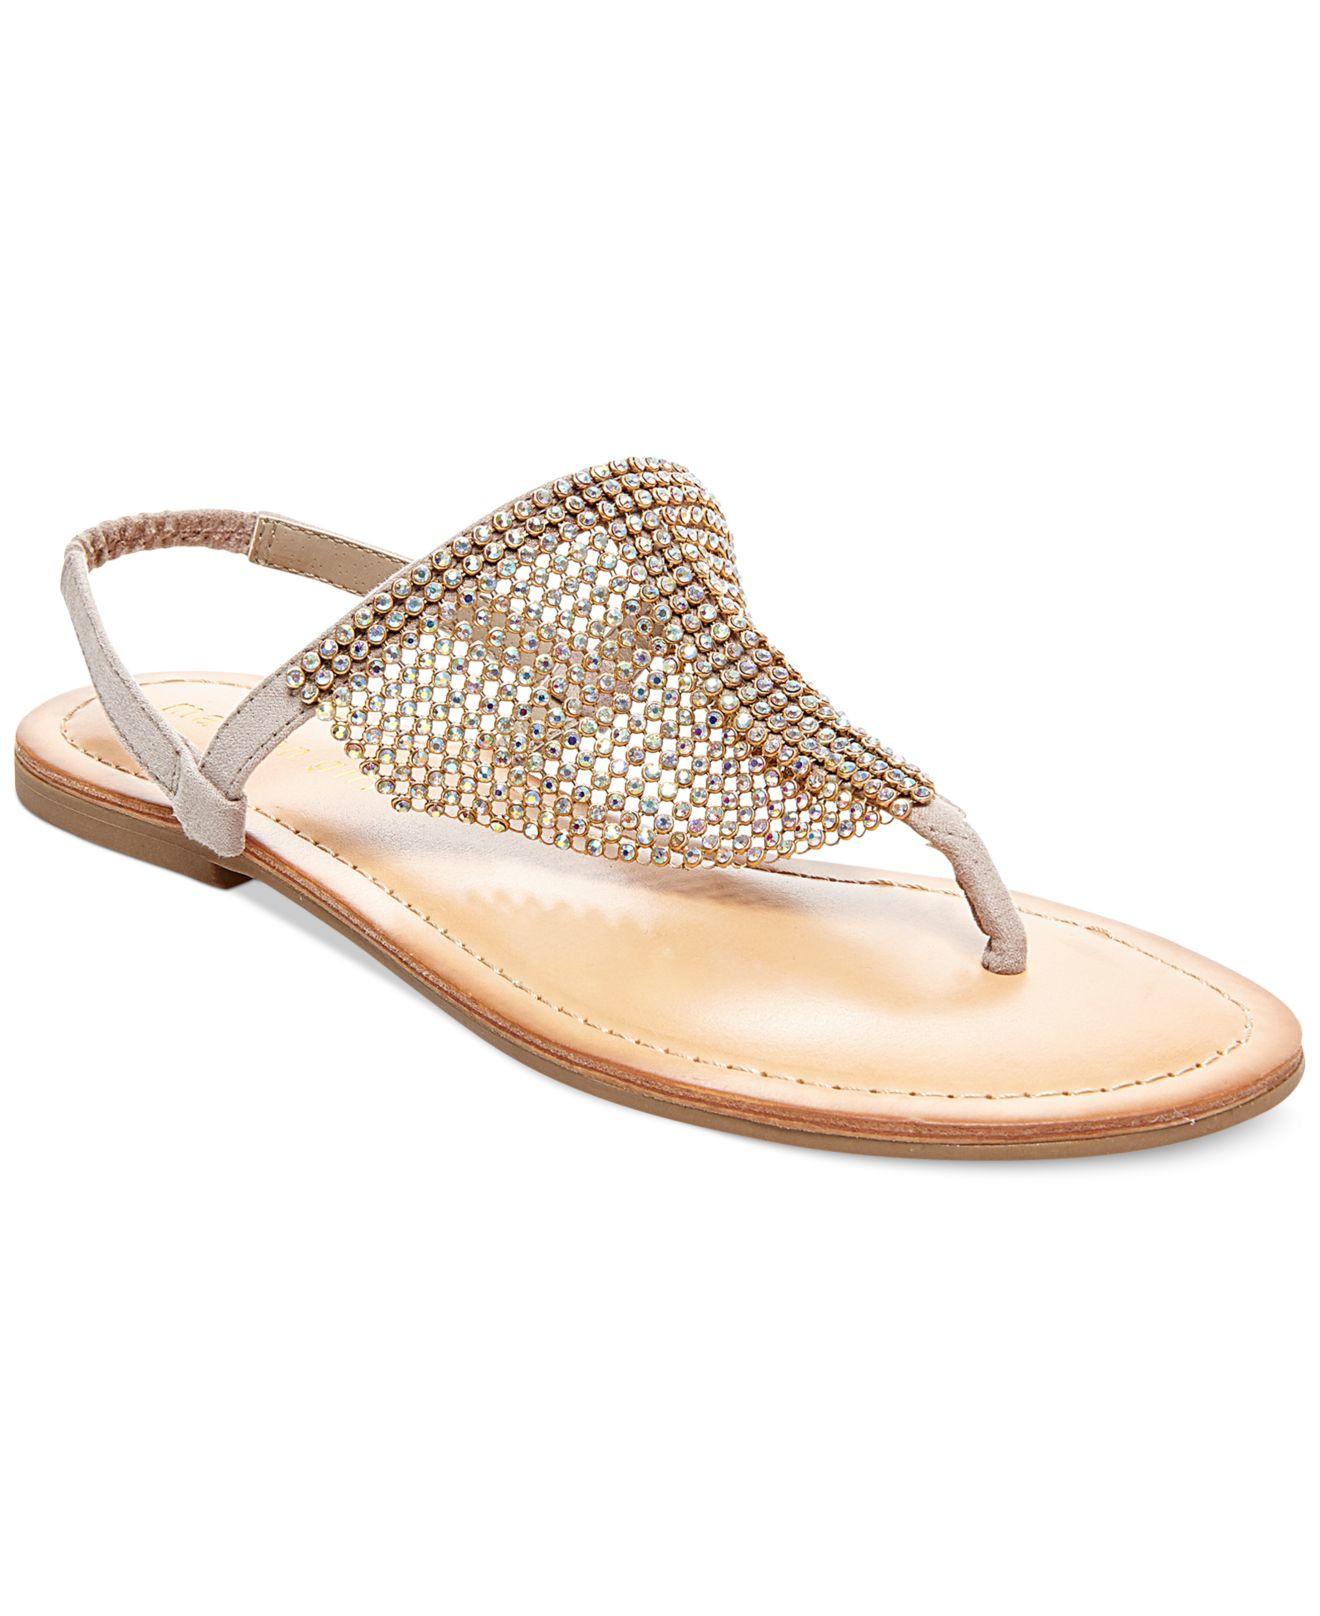 e9e962ef6 Lyst - Madden Girl Sandie Rhinestone Hooded Flat Thong Sandals in ...